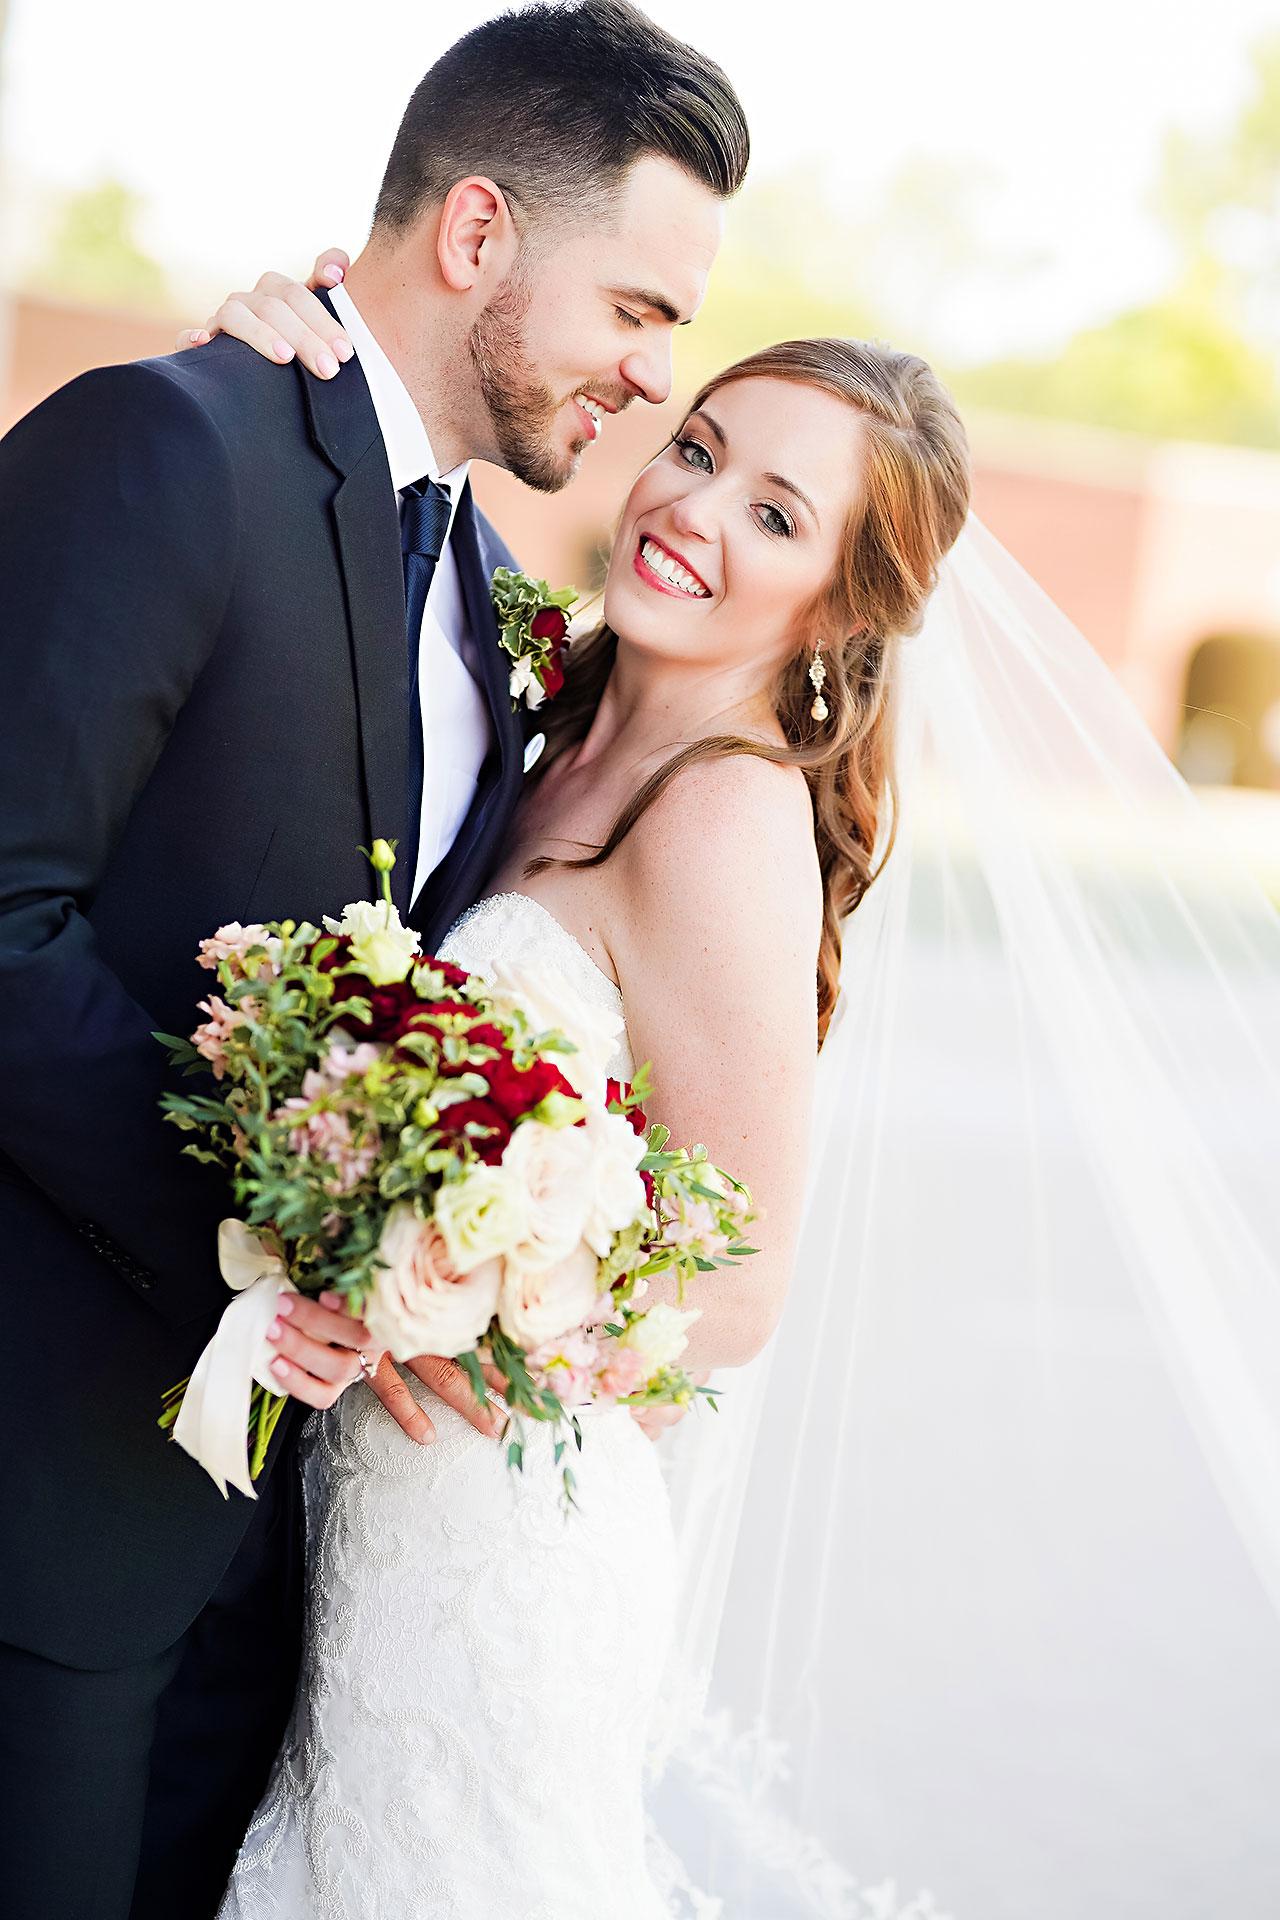 Callie Josh Ritz Charles Garden Pavilion Carmel Indiana Wedding 113